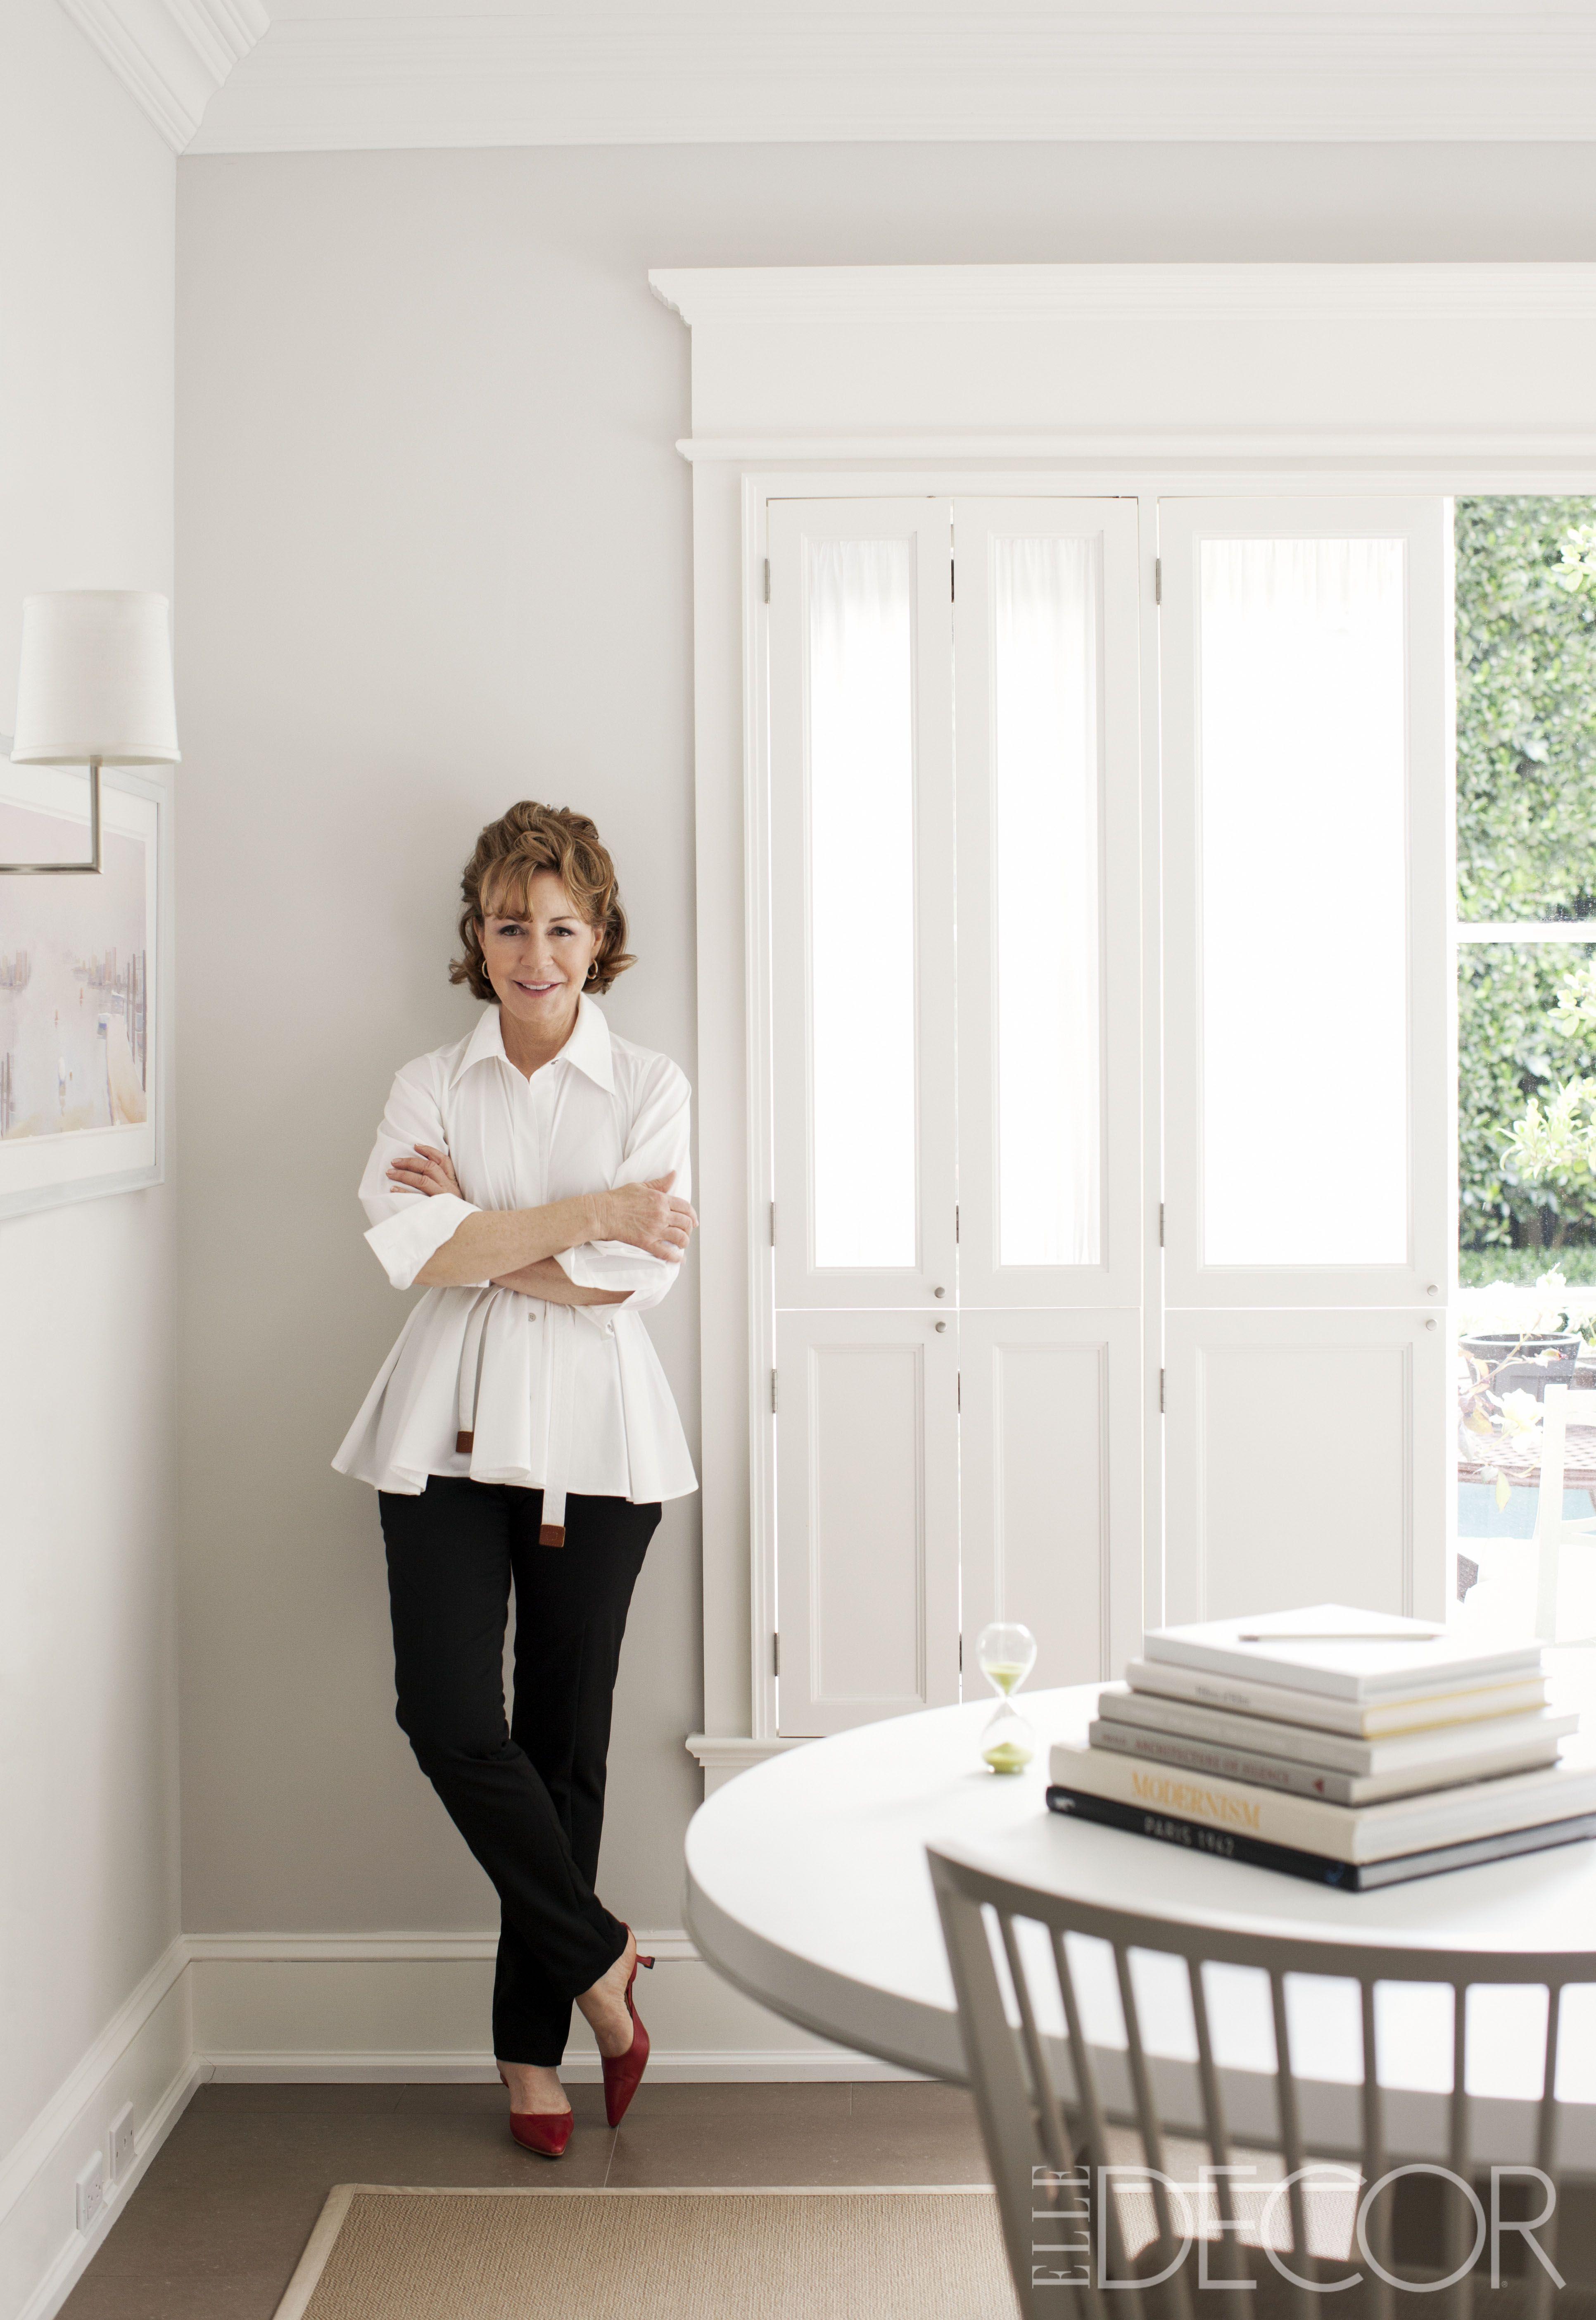 Designer Barbara Barry Favorite Things - Barbara Barry Decor Inspiration